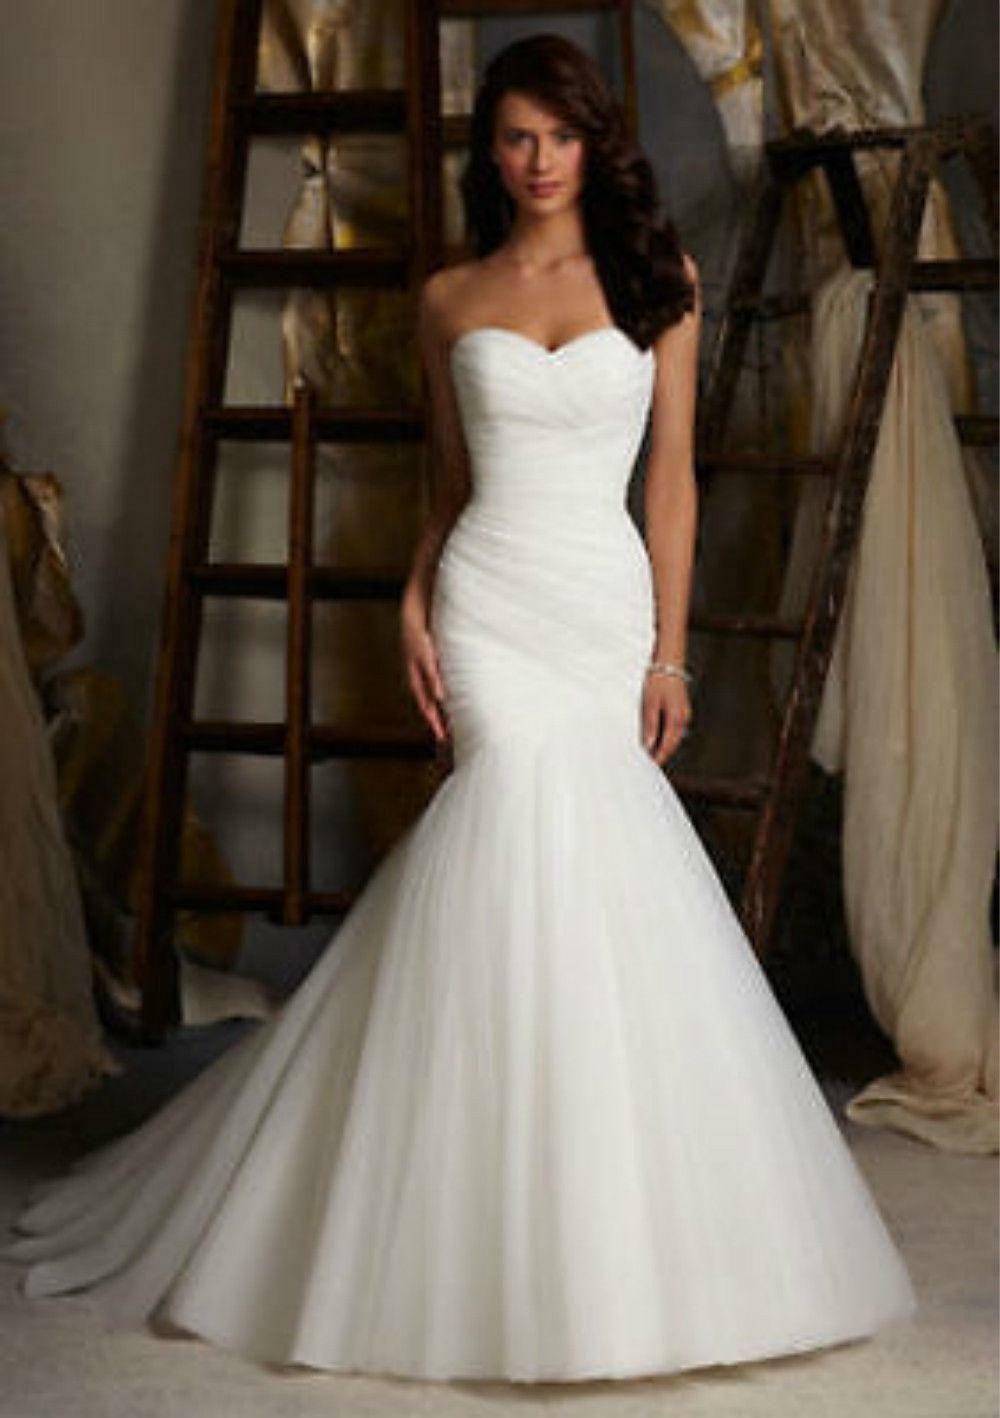 White Ivory Mermaid Wedding Dress Bridal Gown Size 6 8 10 12 14 16 Best Selling Ebay Strapless Wedding Dress Mermaid Wedding Dresses Wedding Dress Sizes [ 1418 x 1000 Pixel ]